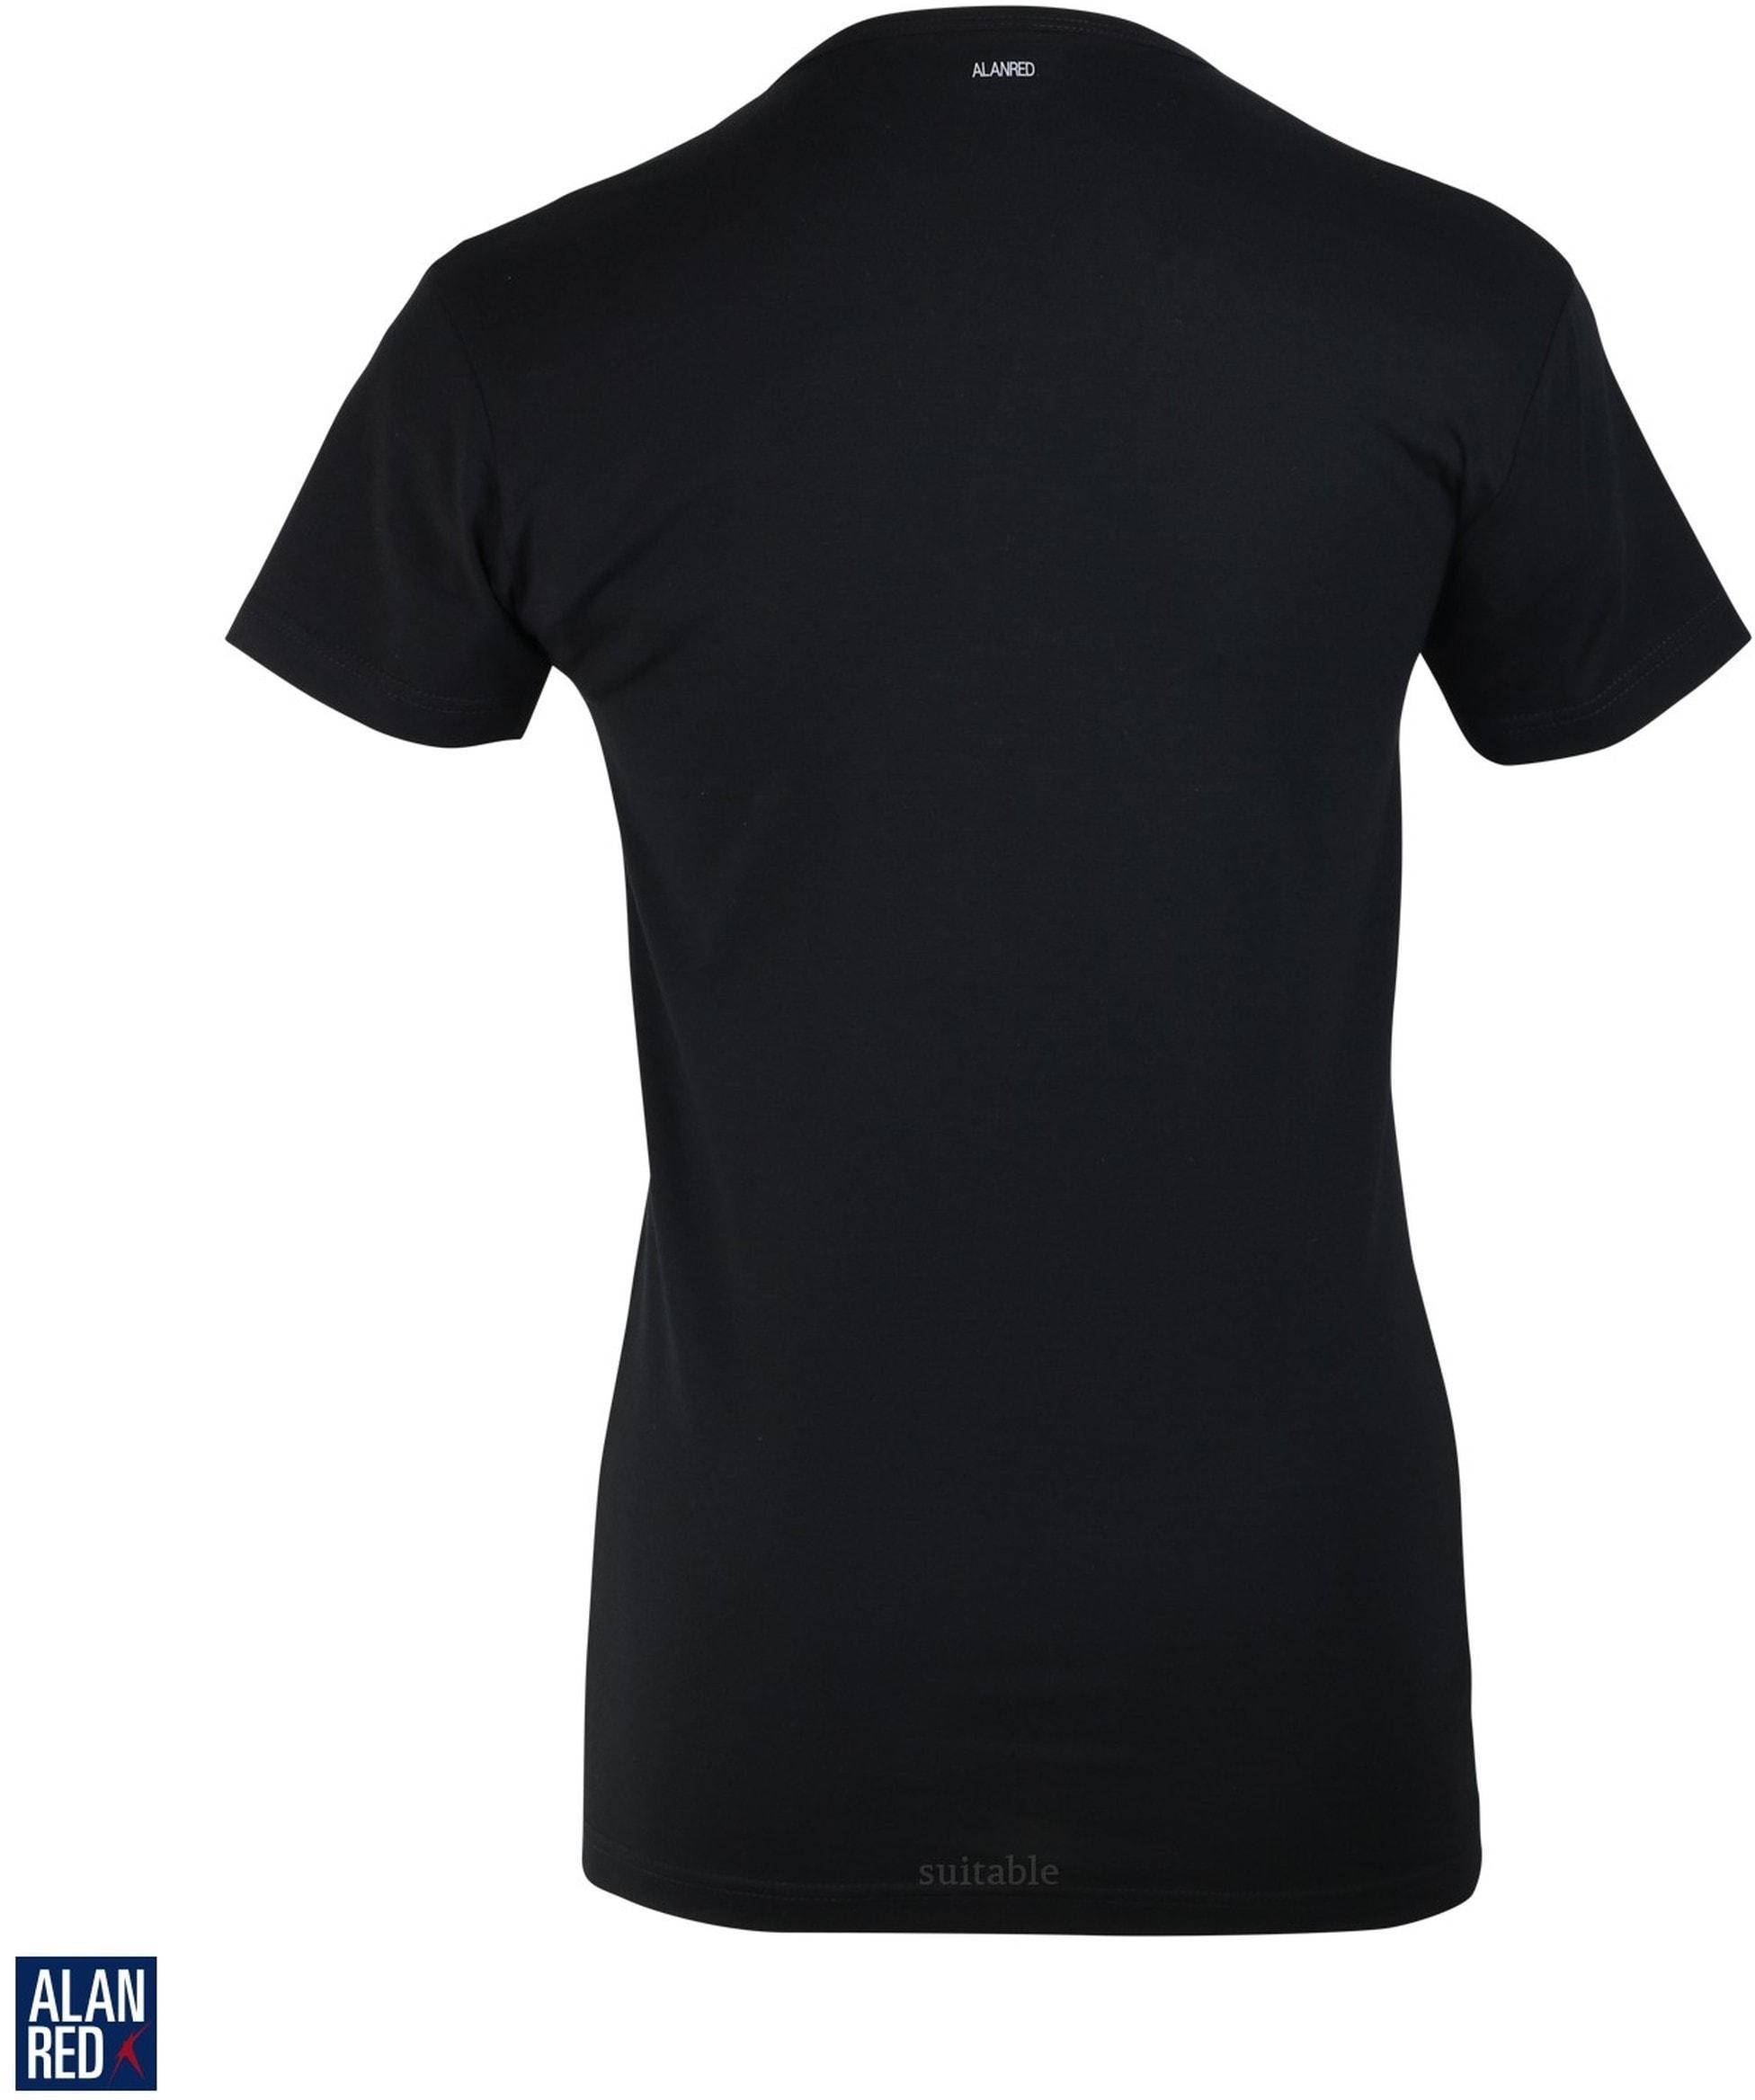 Alan Red Oklahoma Stretch T-Shirt V-Hals Schwarz (1 st.) foto 1